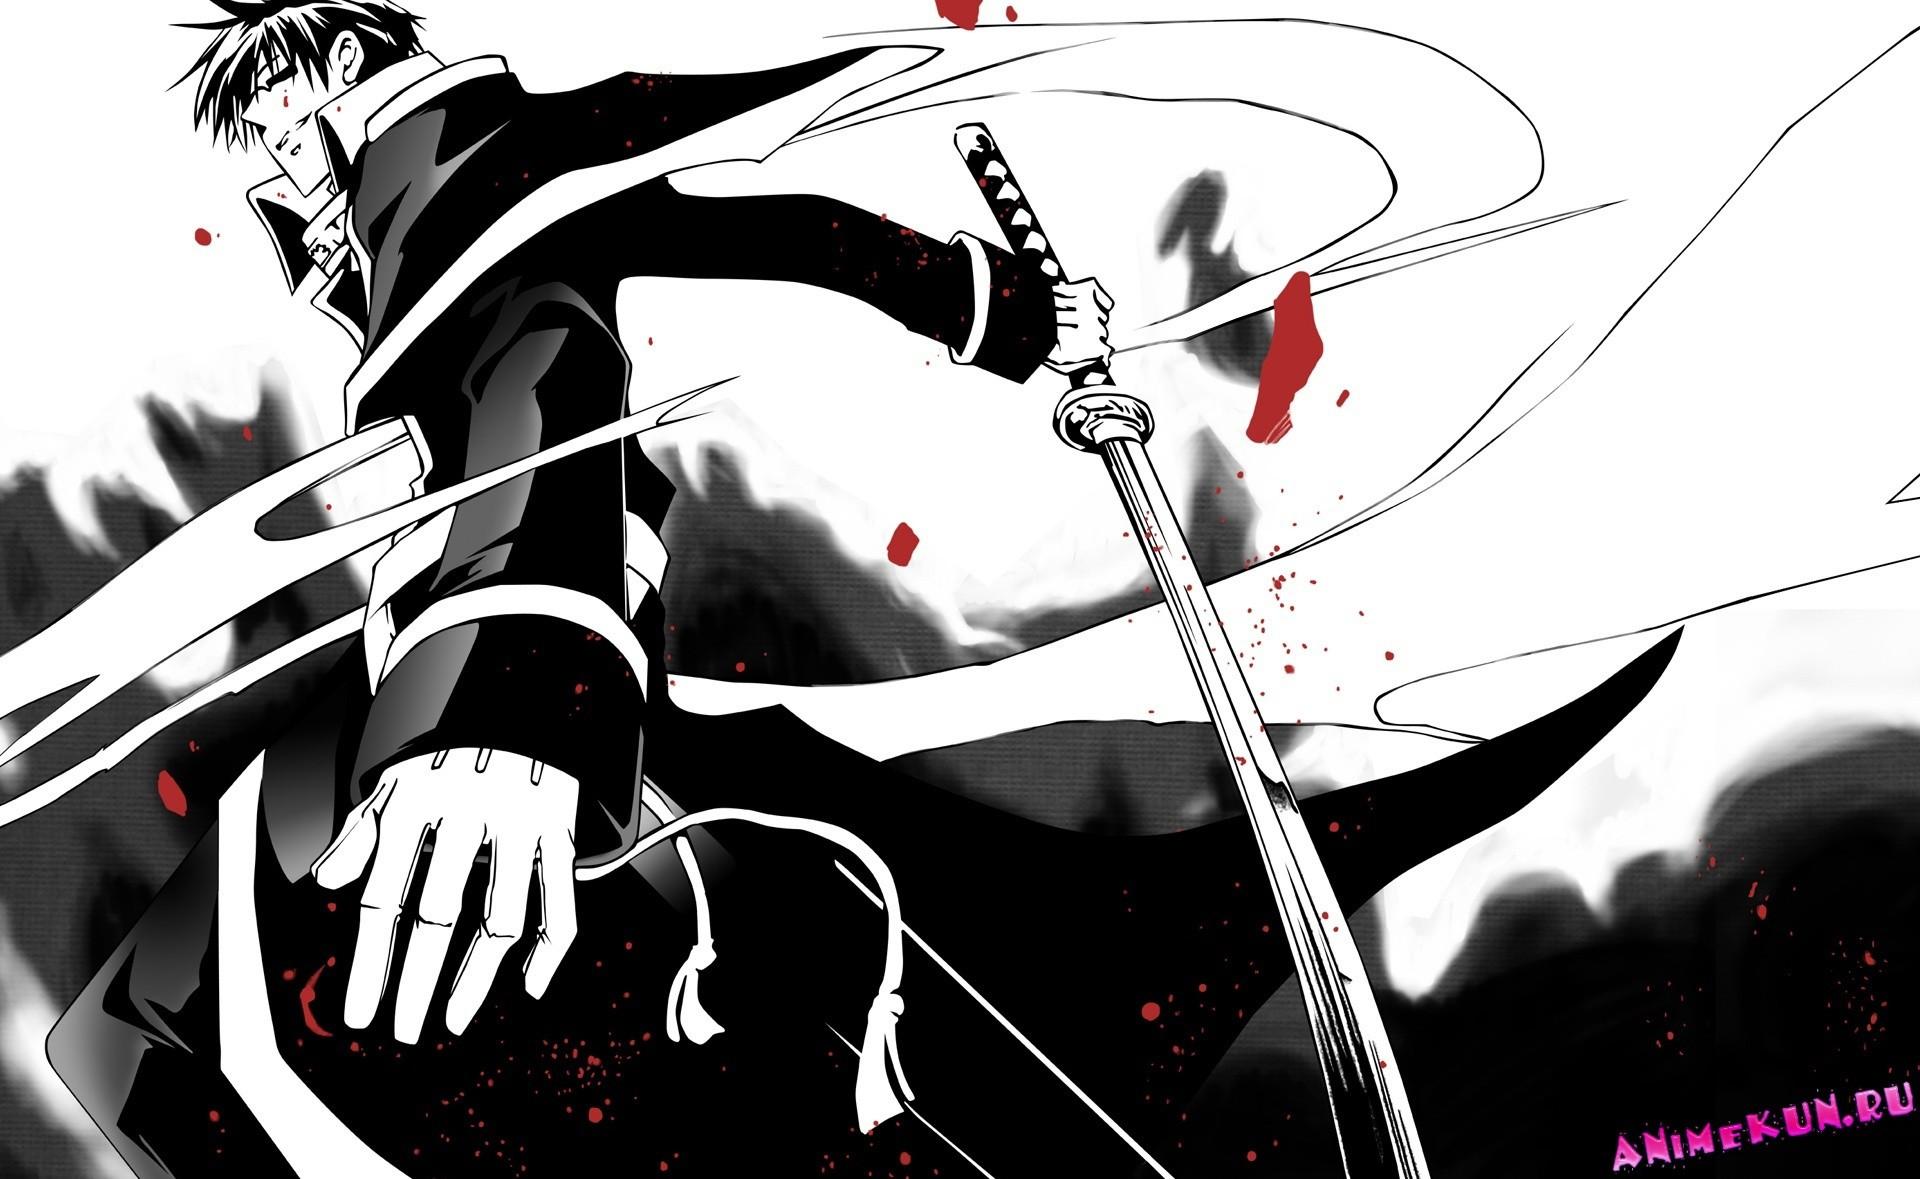 NINJA GAIDEN fantasy anime armor mask blood g wallpaper Anime Ninja Wallpapers  Wallpapers)